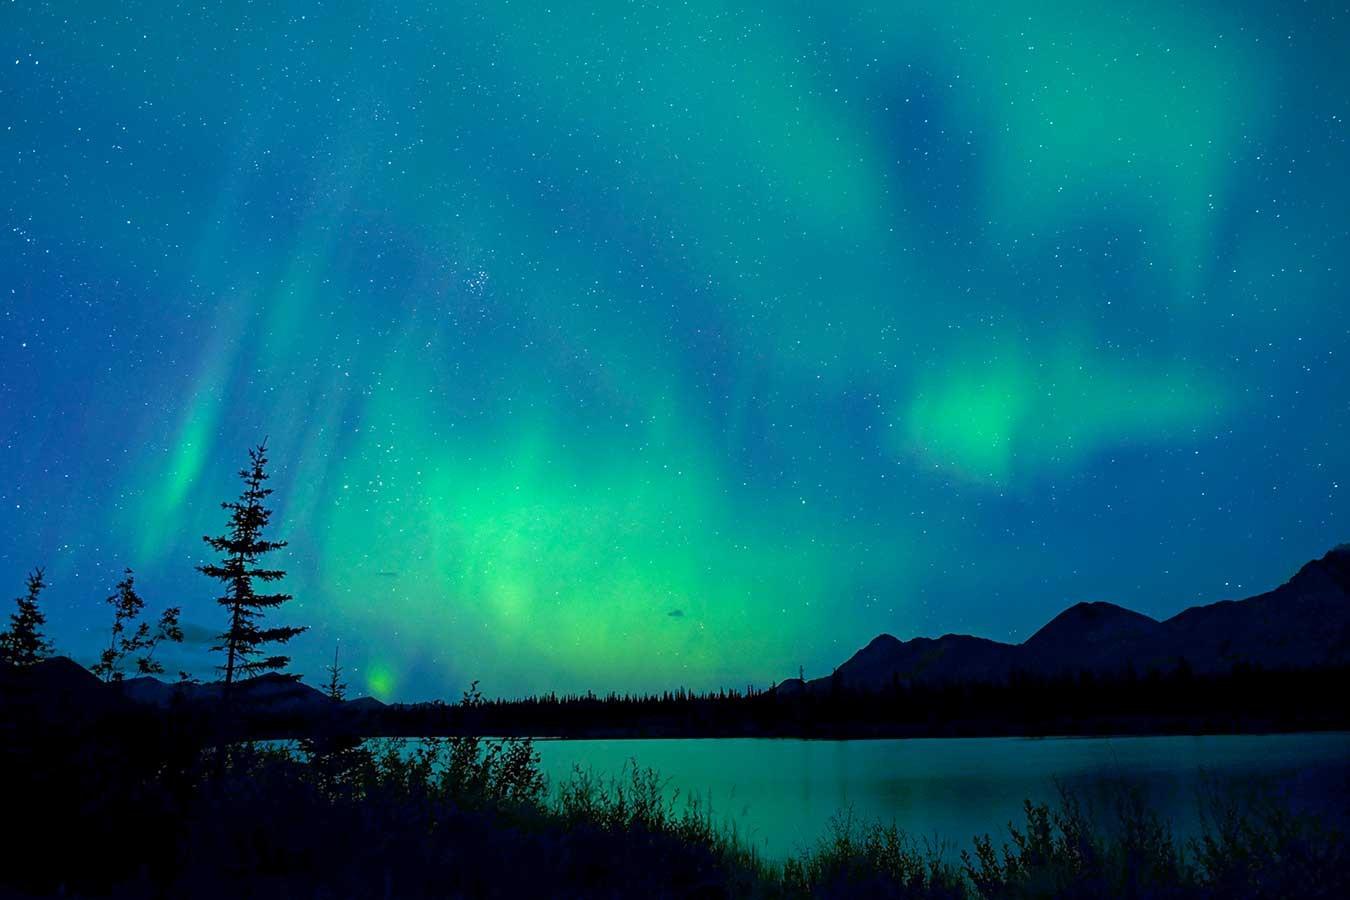 Image of the Aurora Borealis above Denali National Park